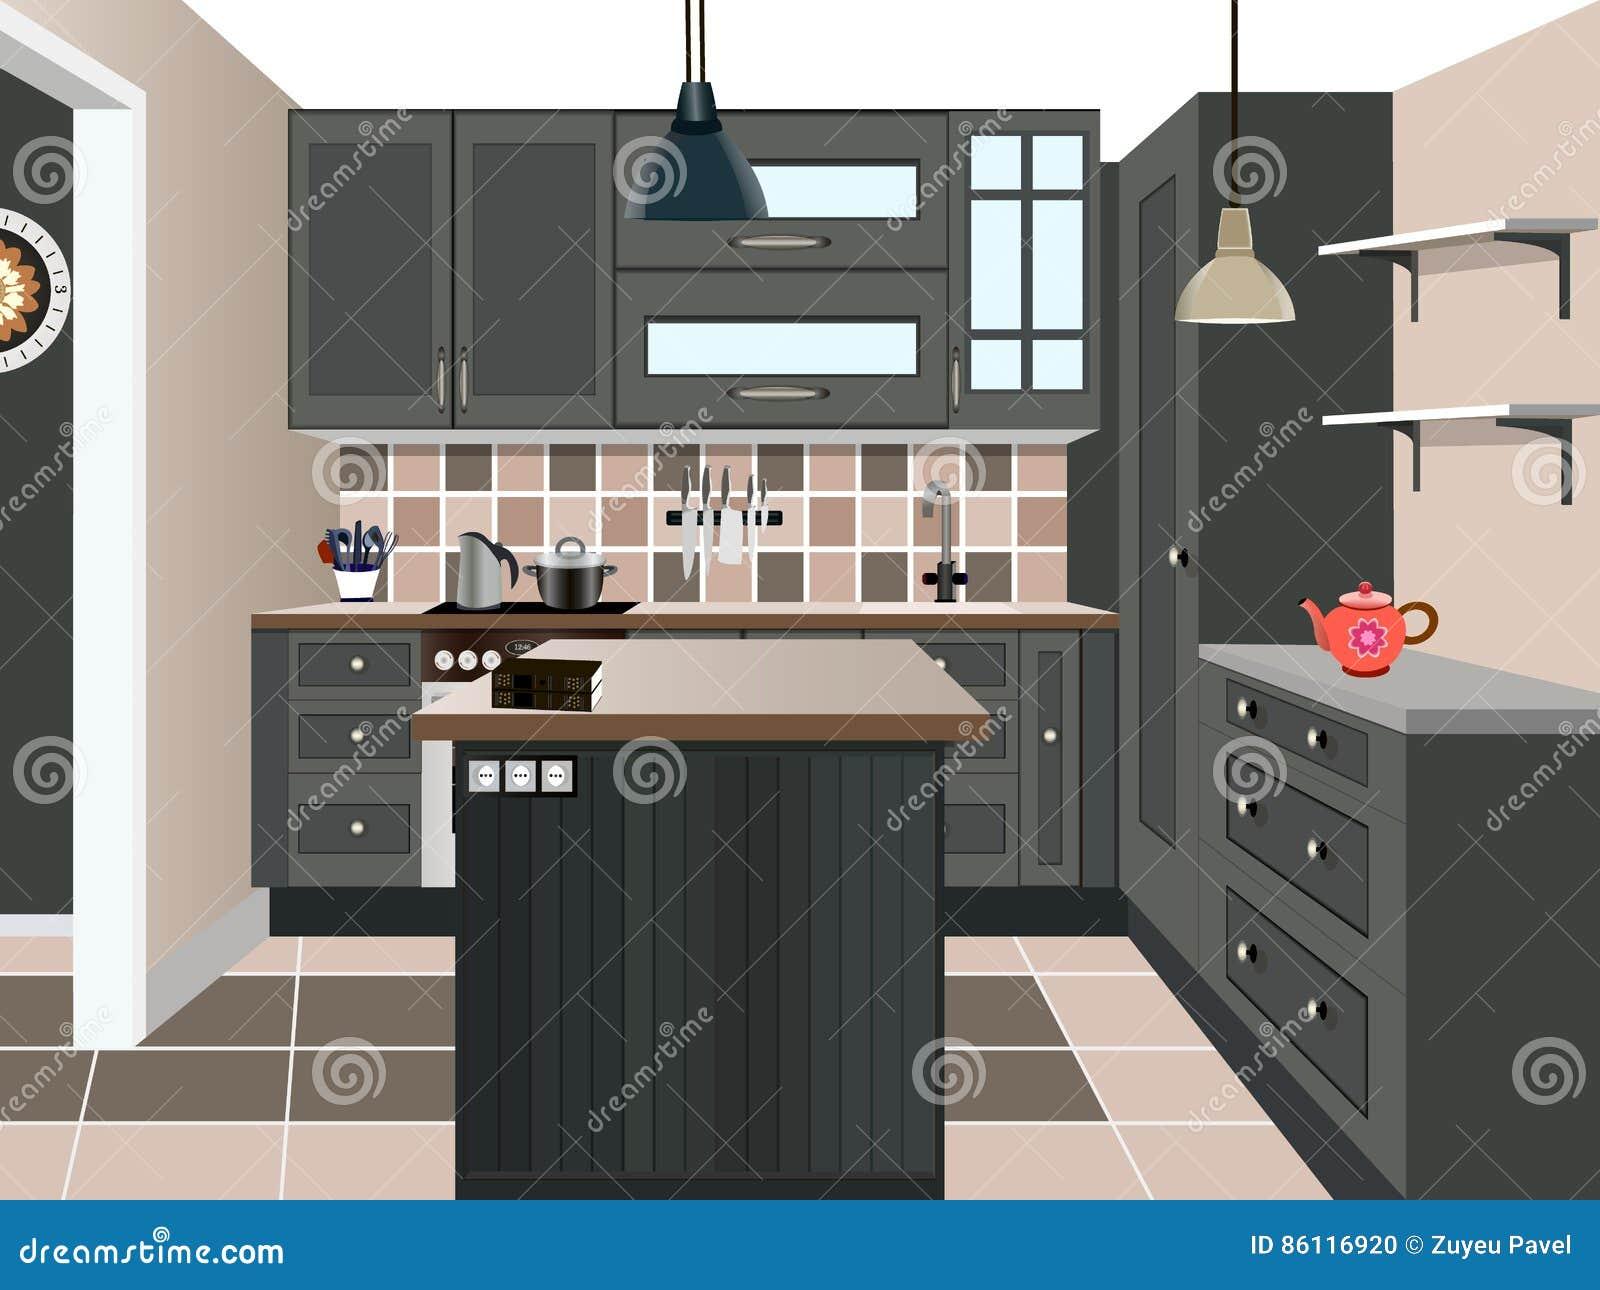 Kitchen Old Design ,kitchen Icon,interior Room, Symbol Furniture, Vector  Illustration